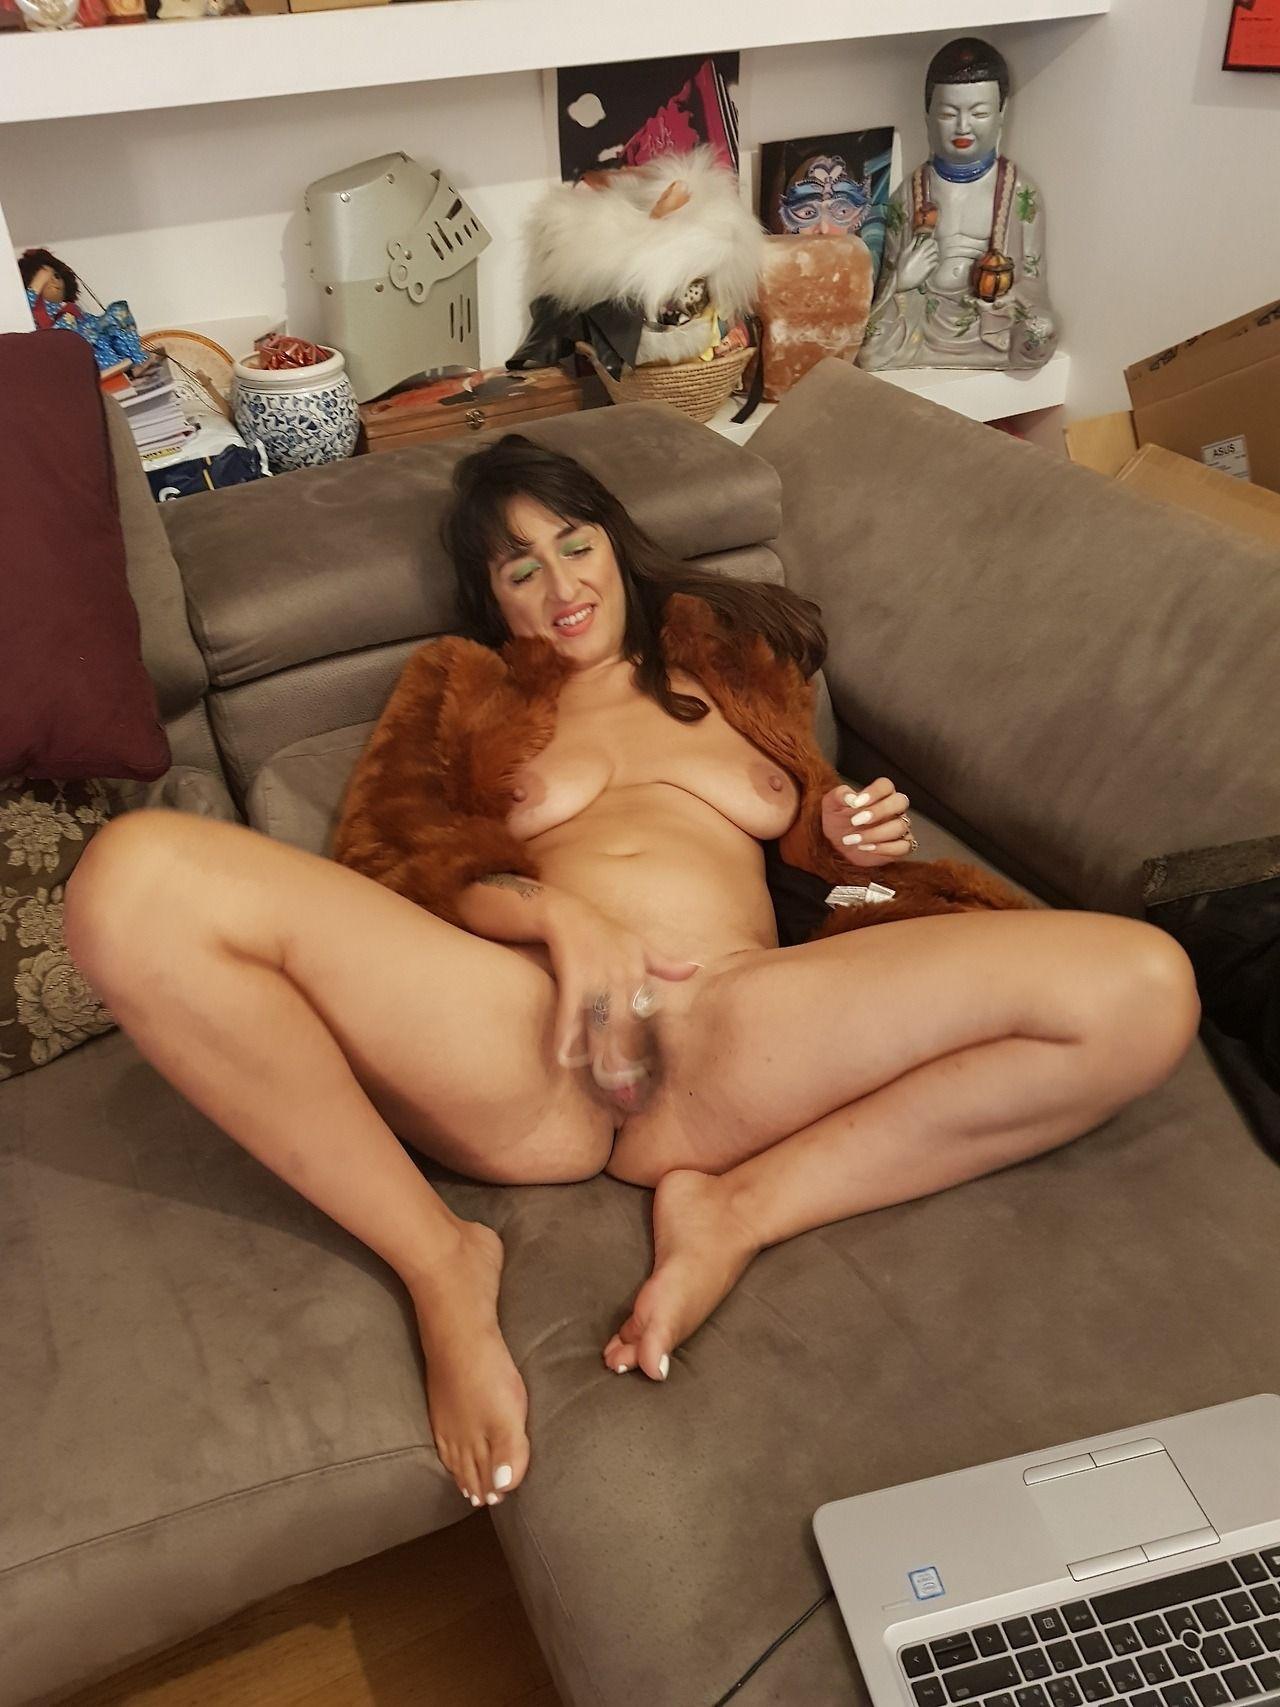 Huge plump natural boobs